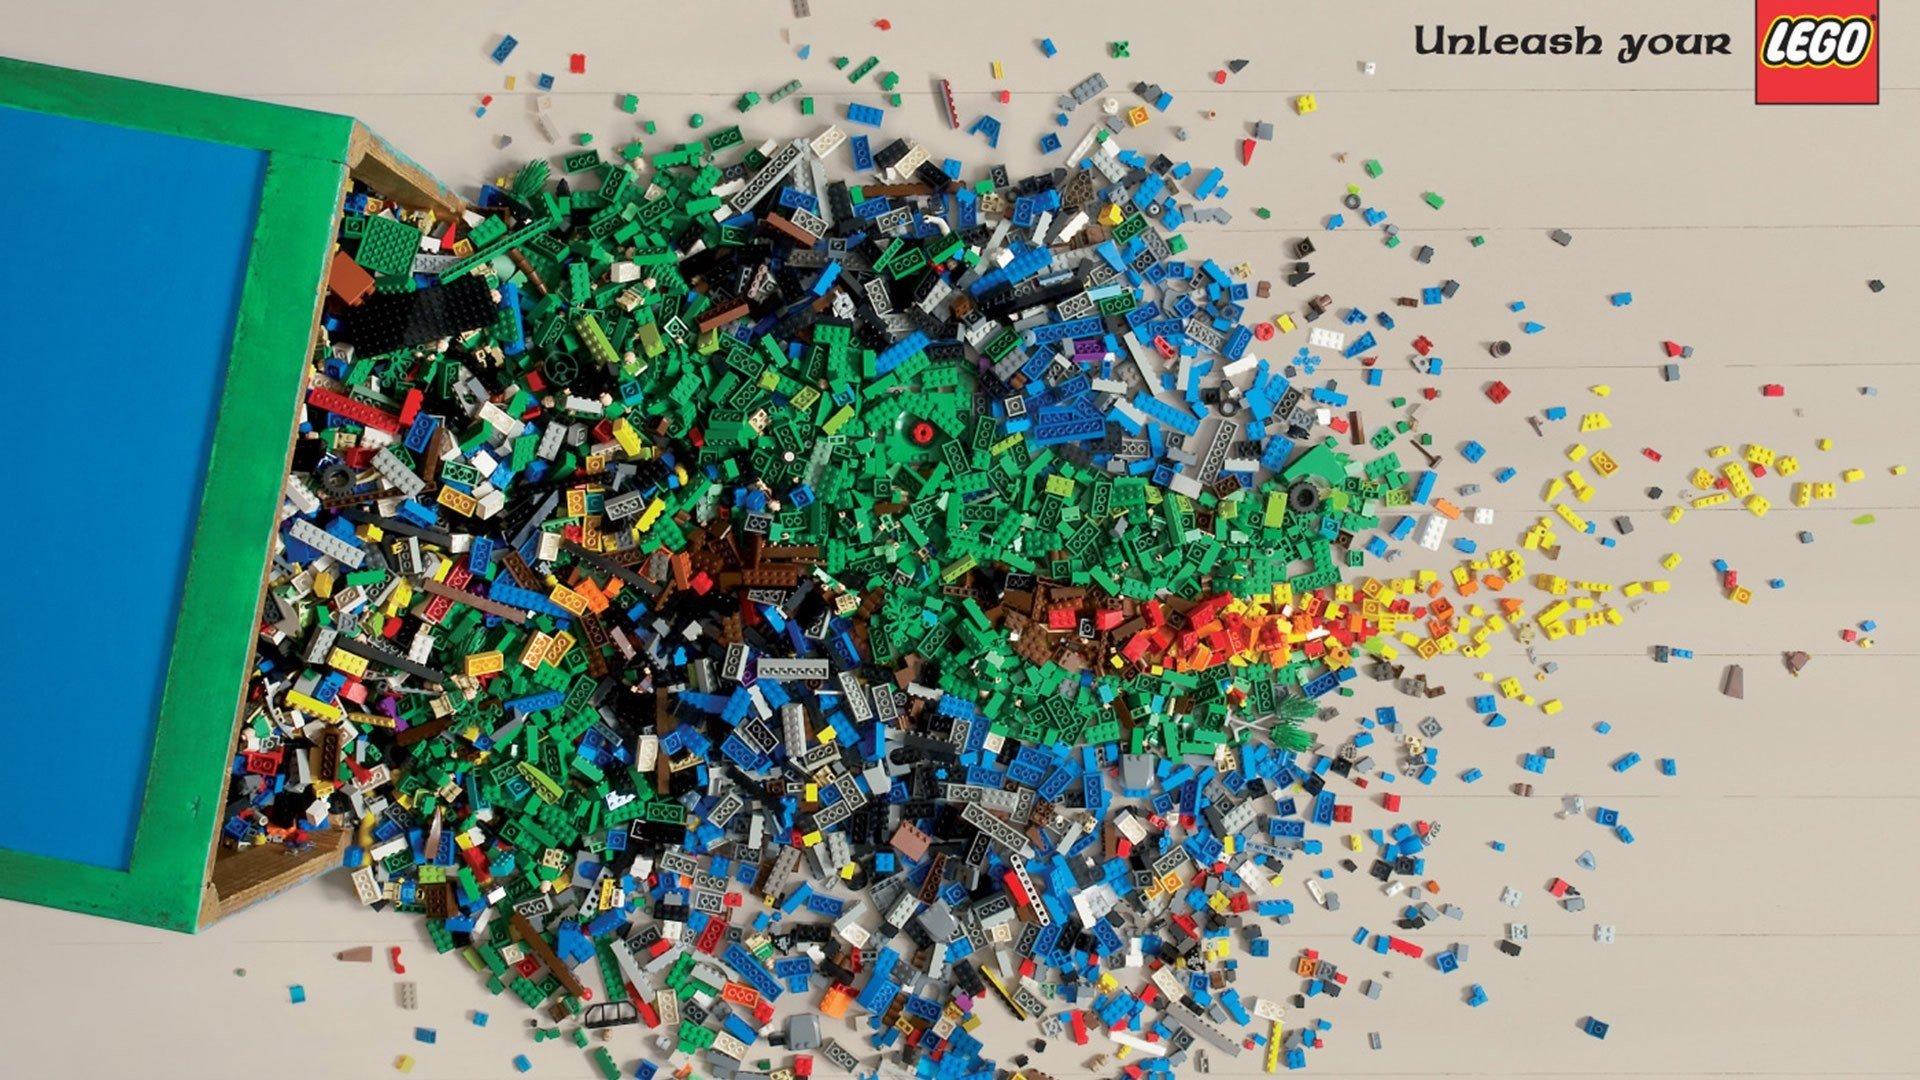 Wallpaper clipart chemistry Childhood Legos Toys (children) Legos